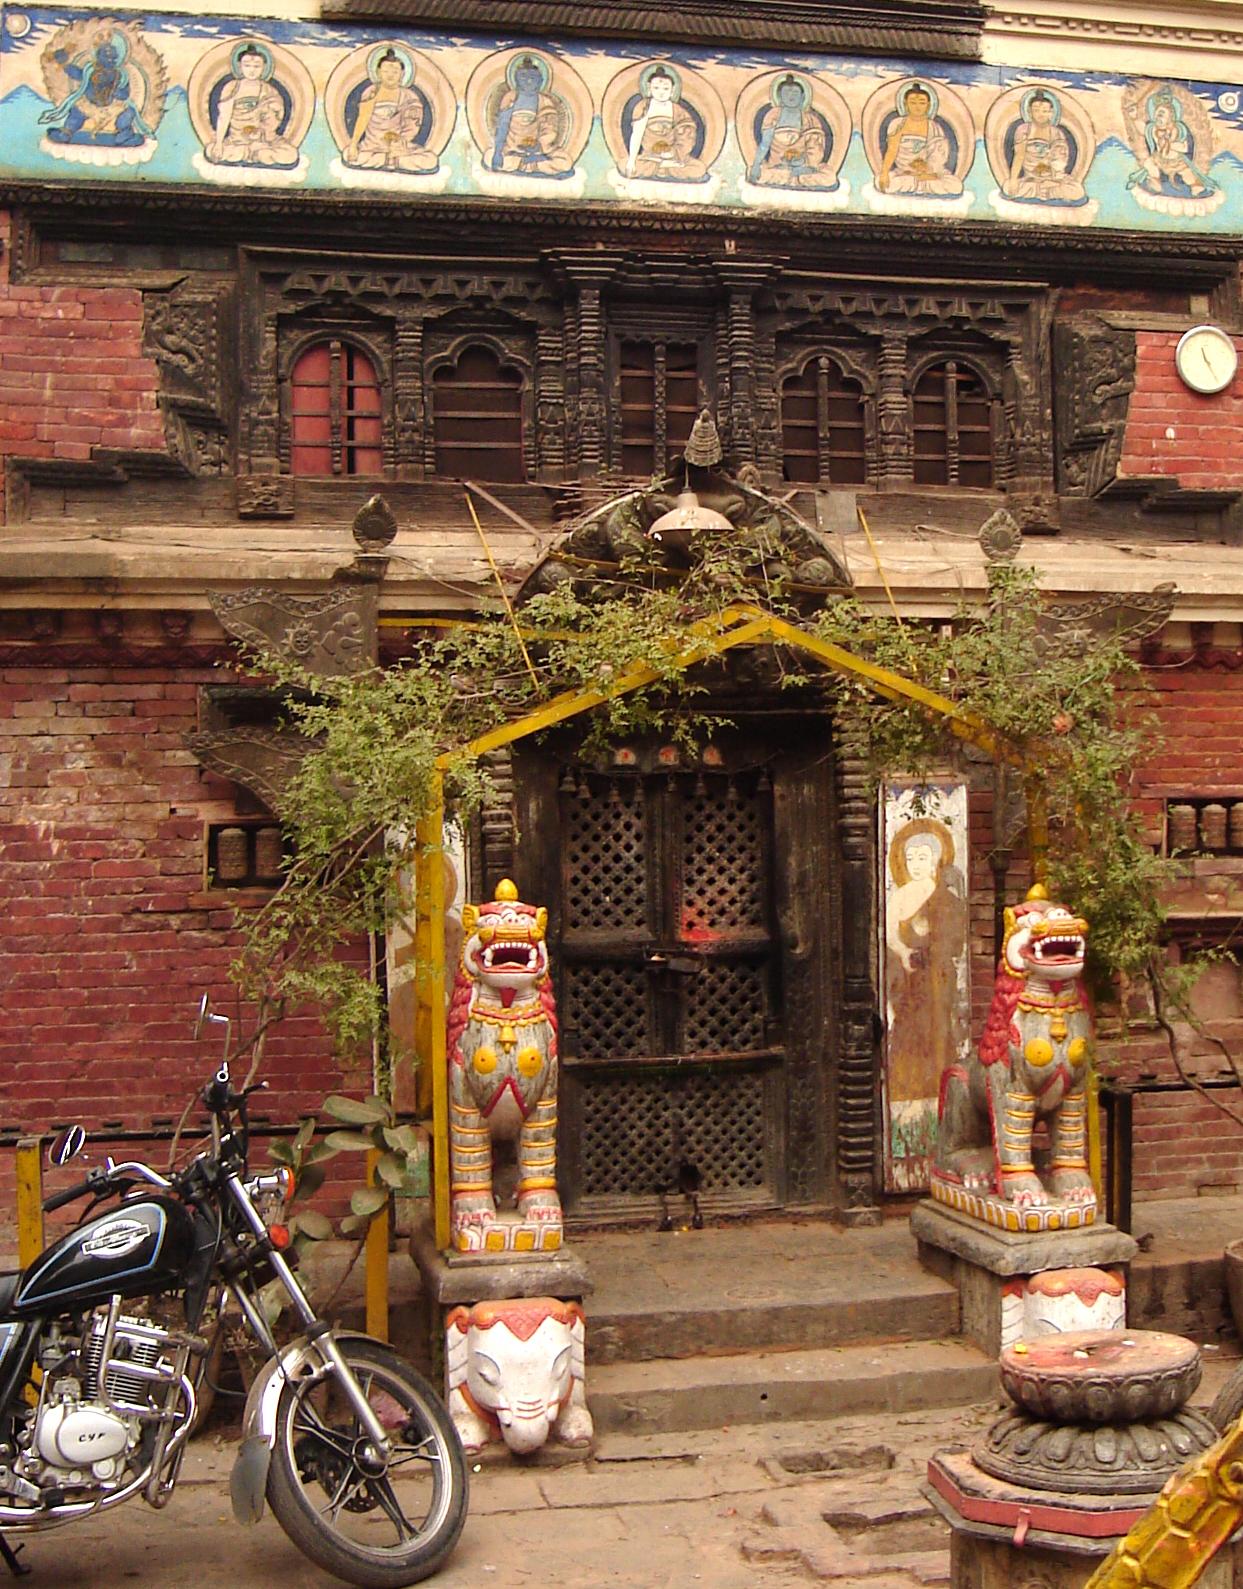 OLD TIBETAN BUDDHIST TEMPLE KATHMANDU NEPAL